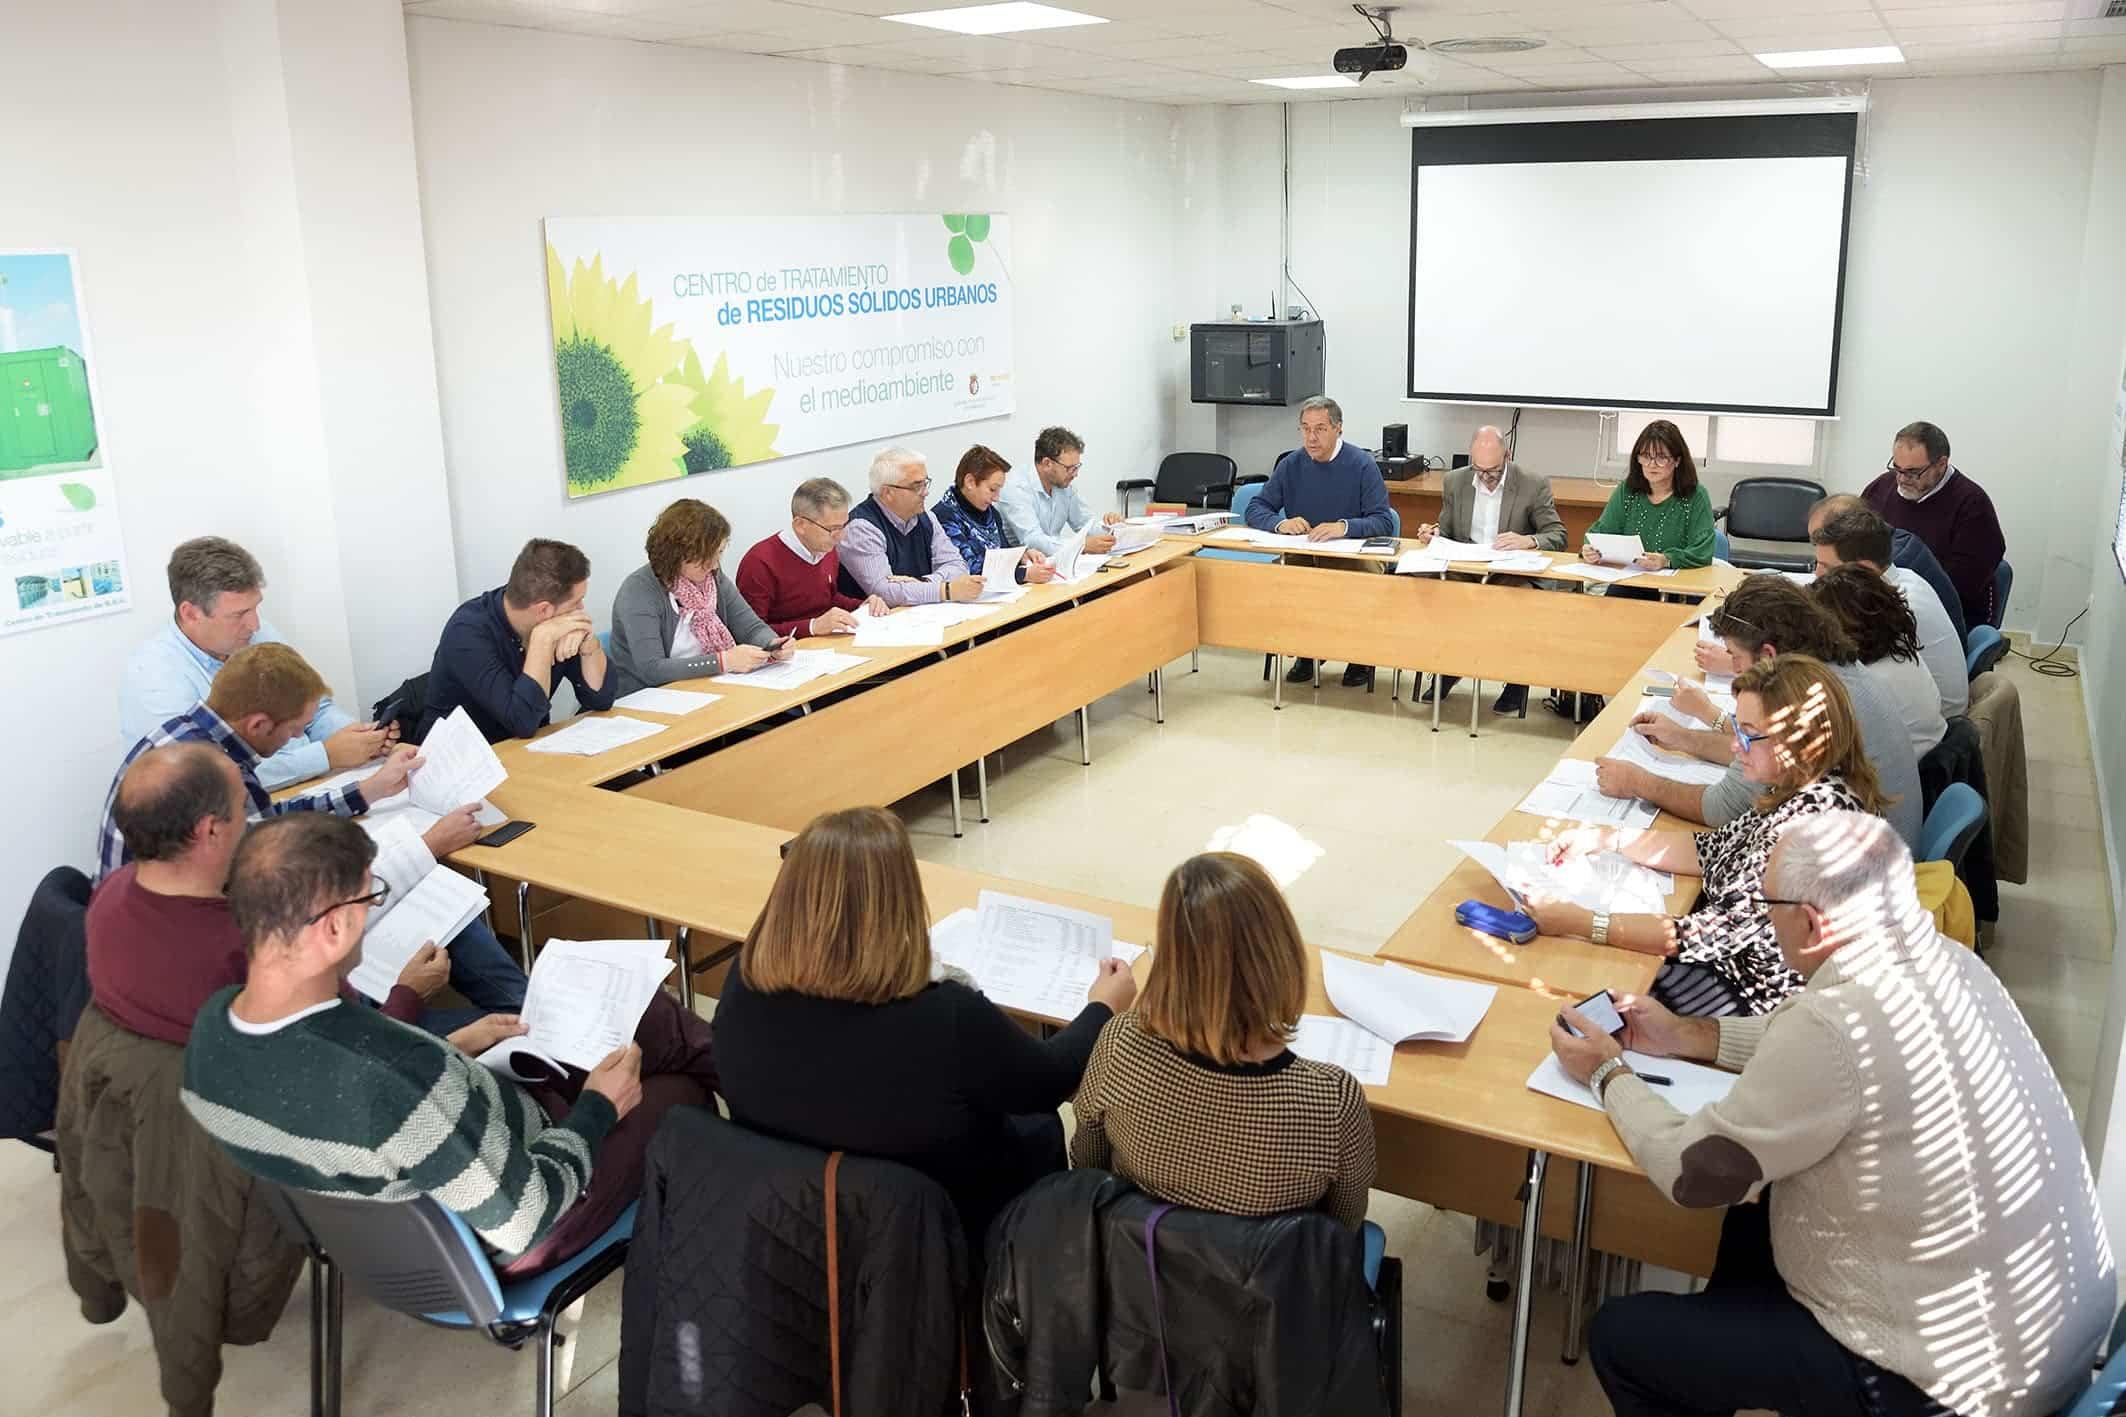 20191109 Pleno y visita a la planta06 Comsermancha - La Corporación de Comsermancha visita la planta de RSU